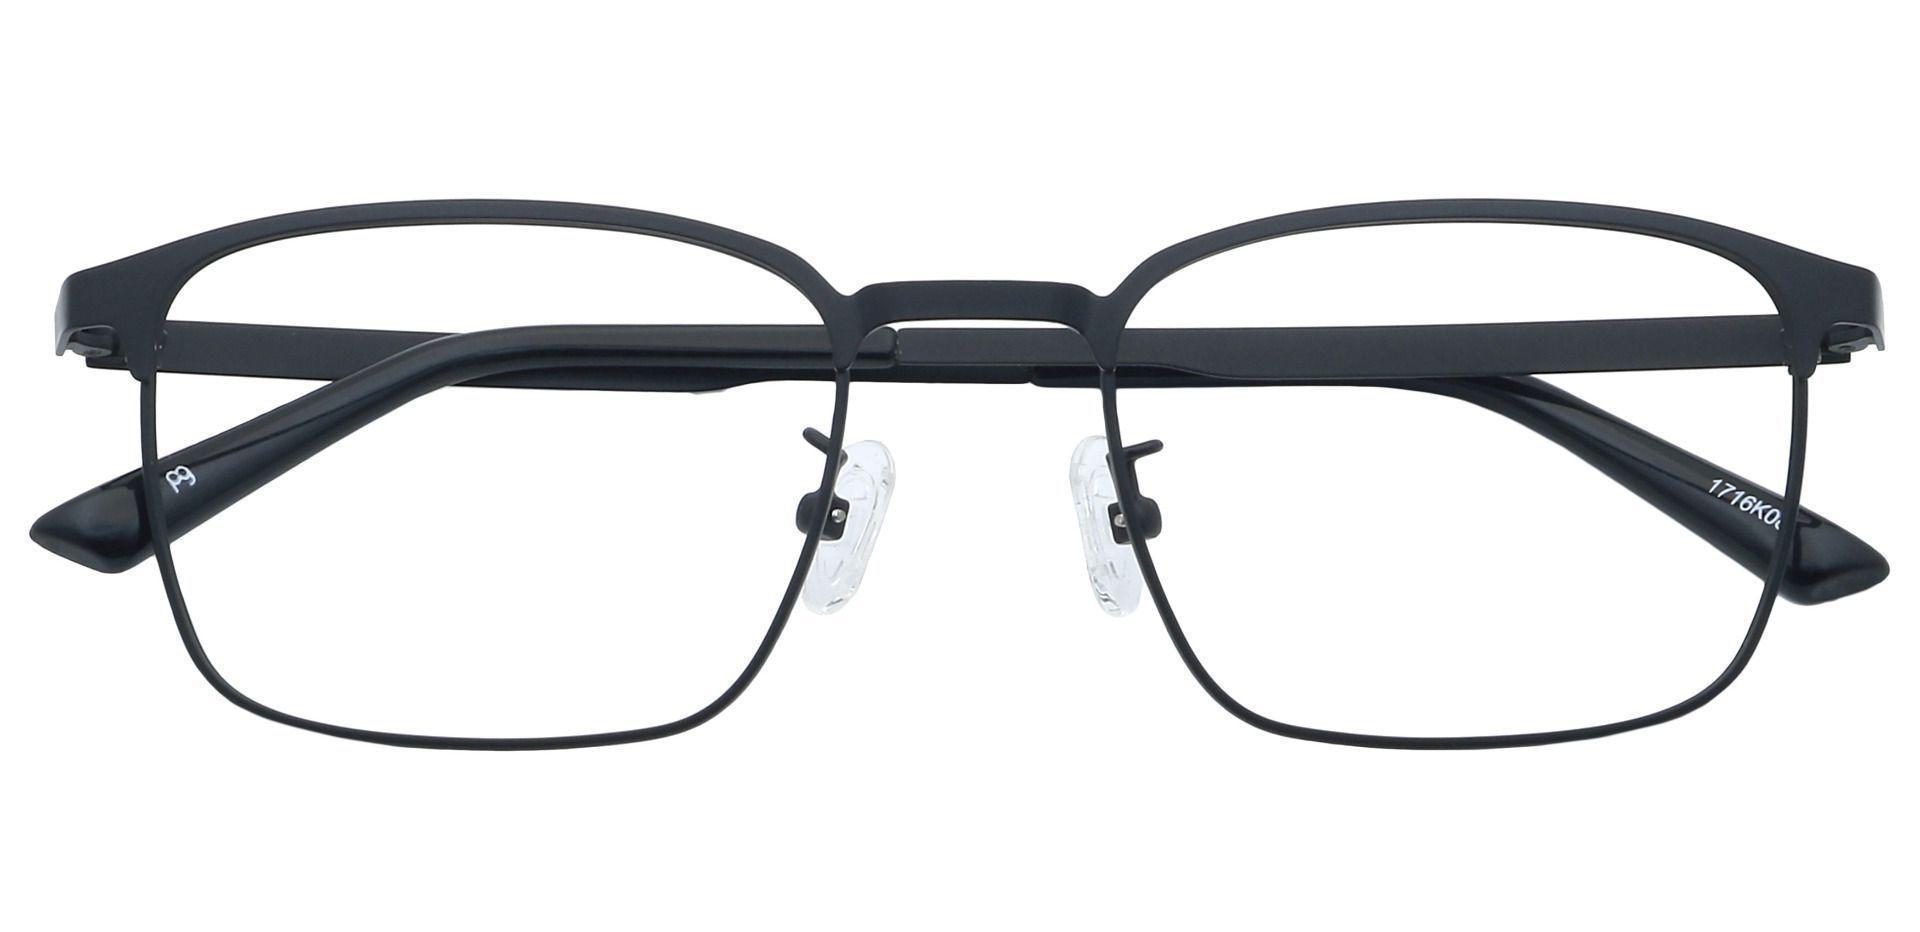 Kingston Square Prescription Glasses - Black